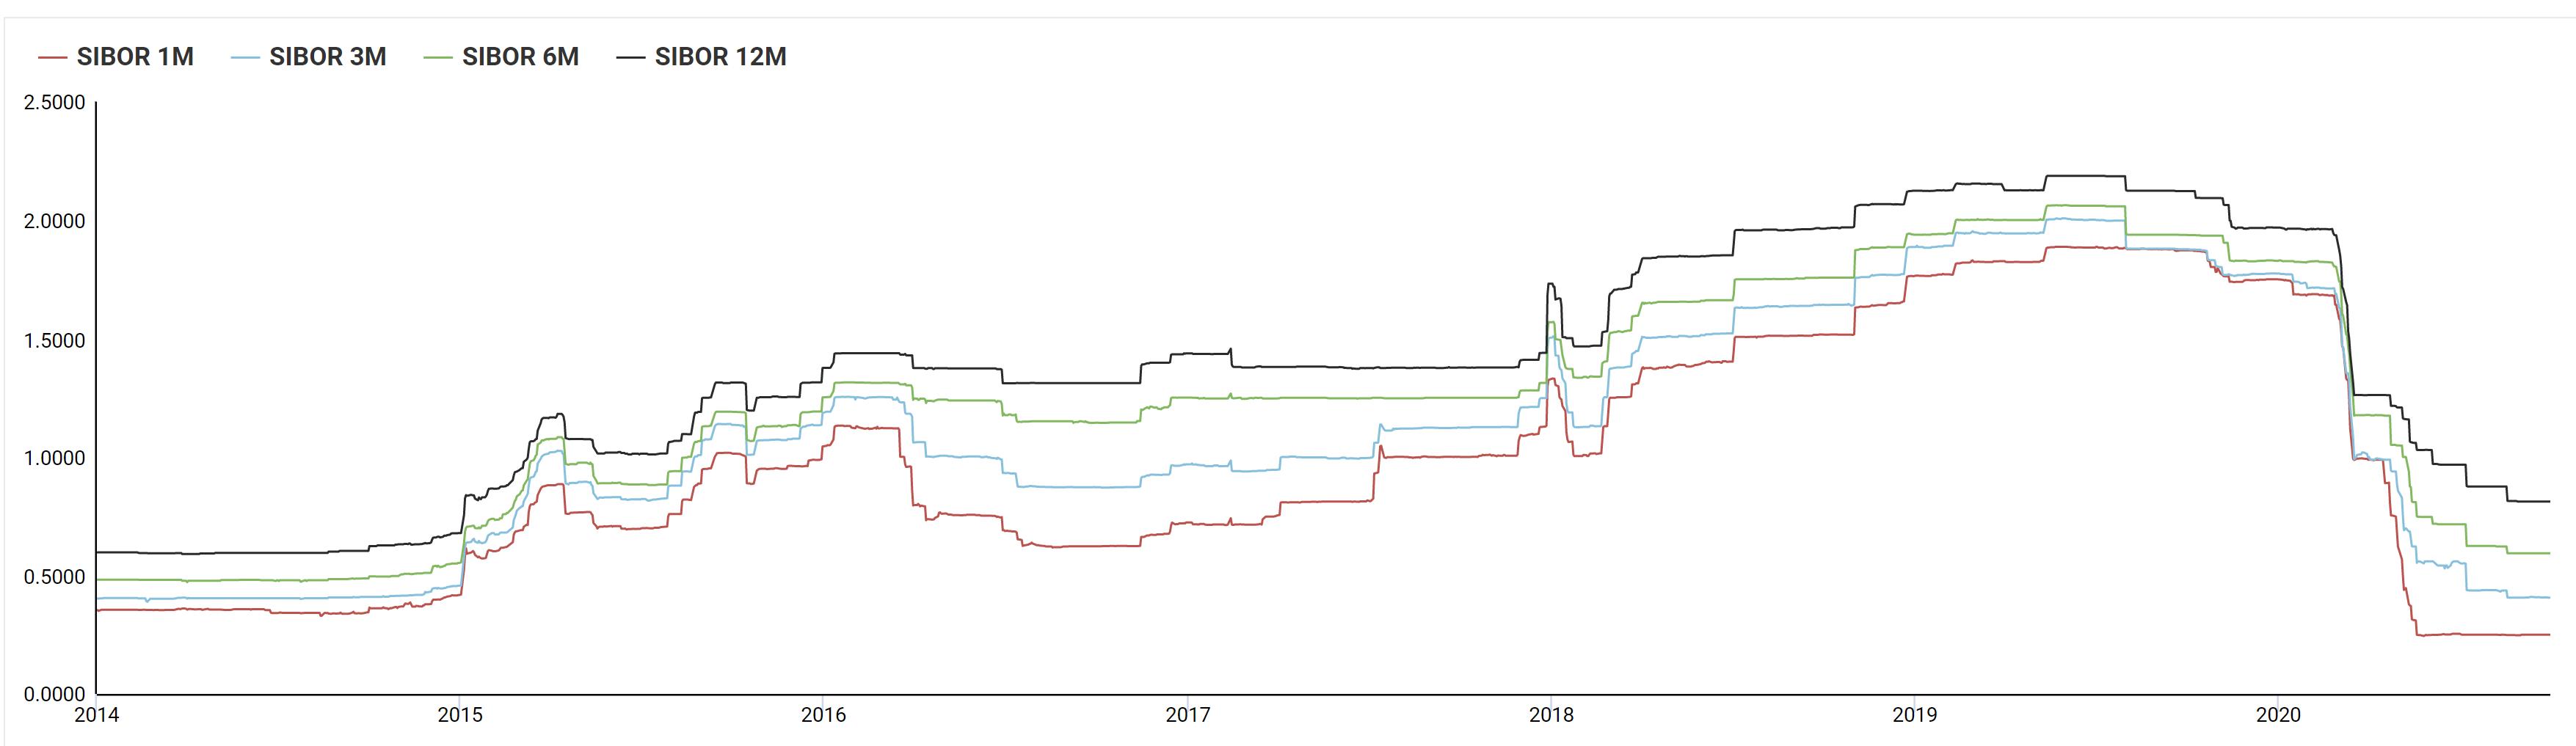 sibor rate singapore chart sep 2020